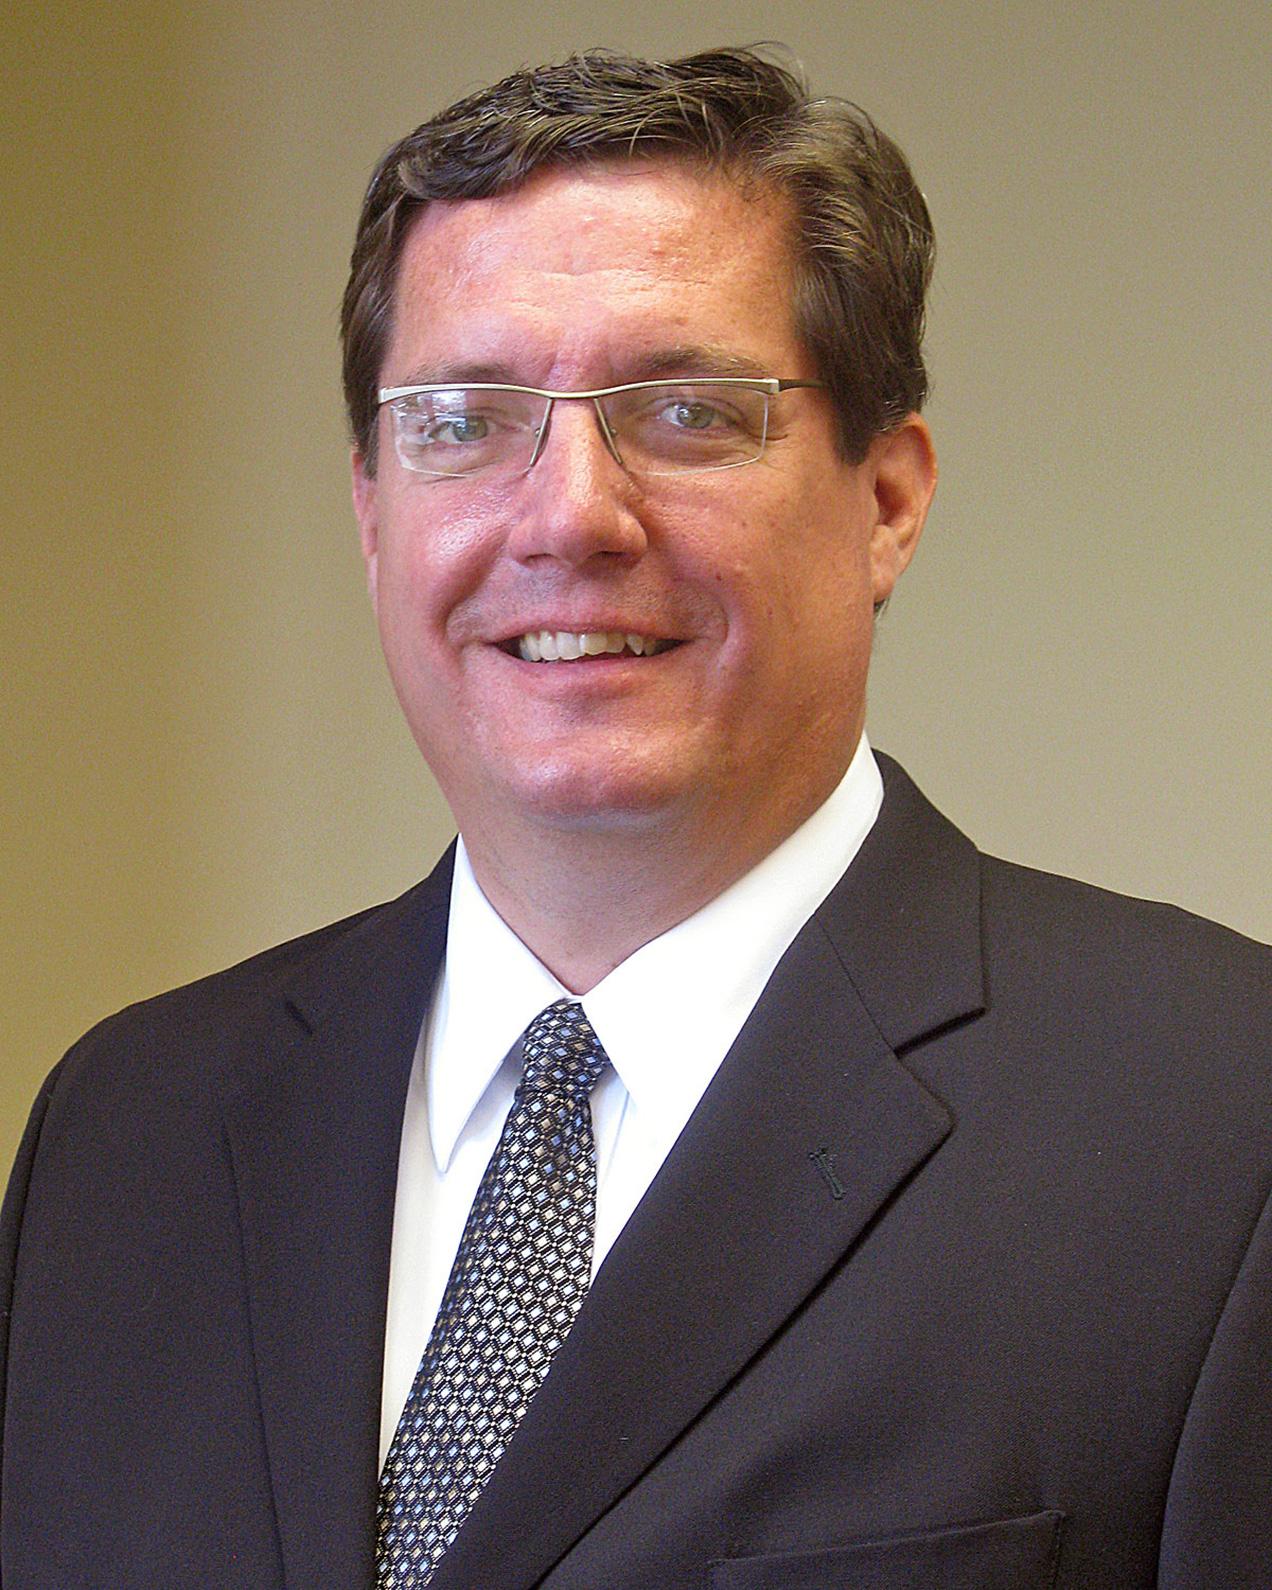 Headshot of Jim Hochstatter